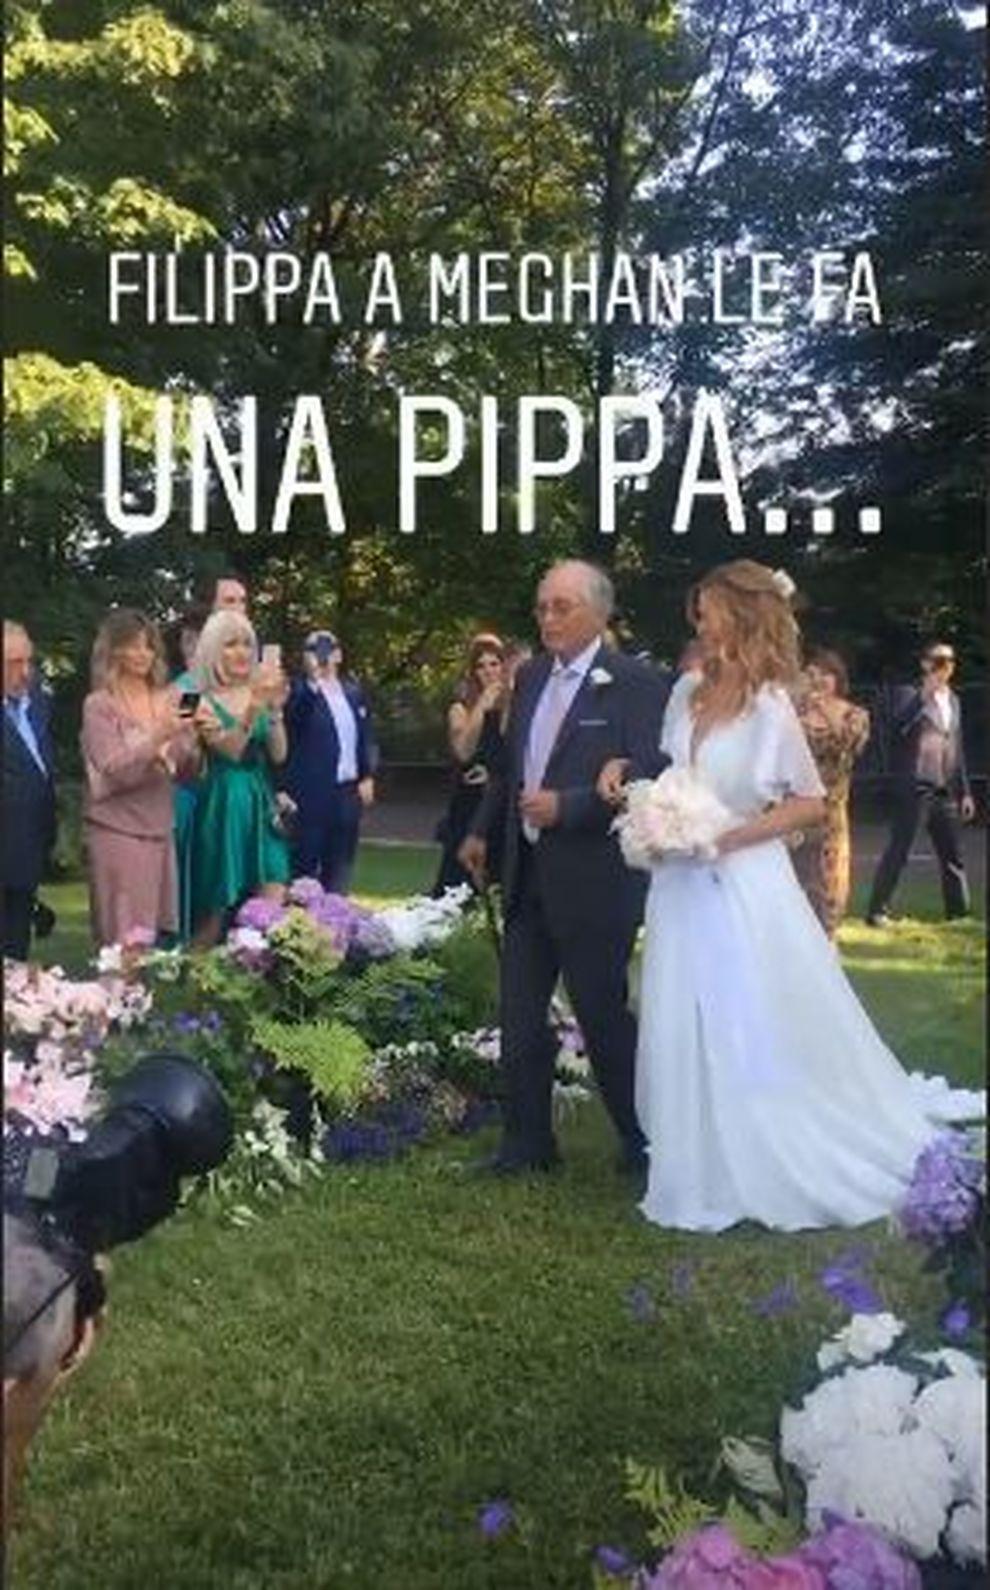 Matrimonio Bossari Lagerback : Fillippa lagerback e daniele bossari sposi in tv barbara